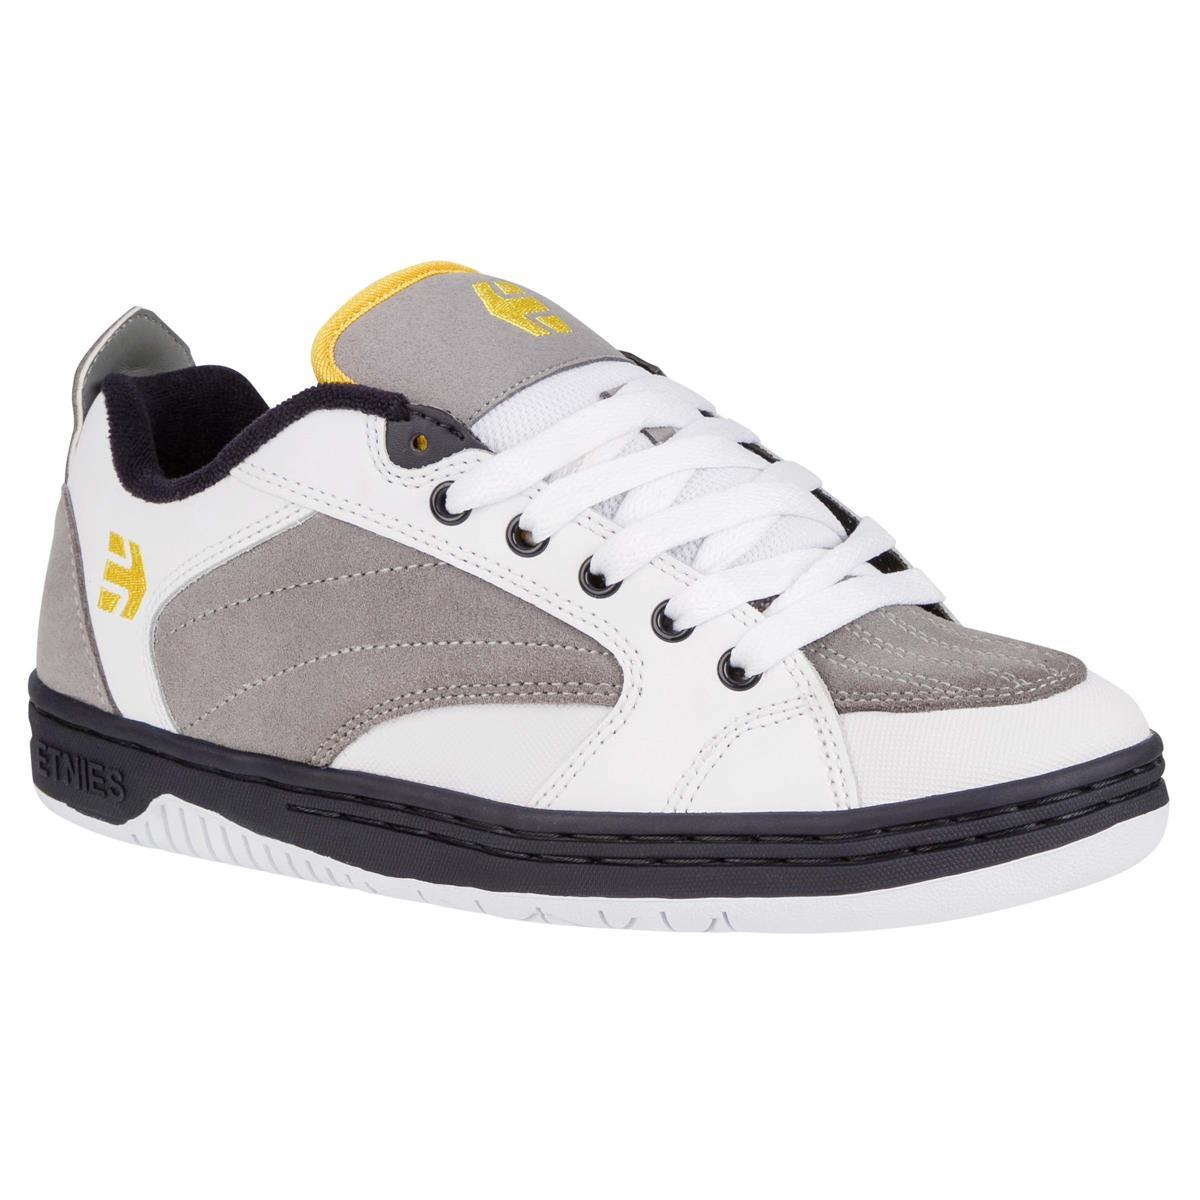 Etnies Schuhe Czar Weiß/Grau/Navy